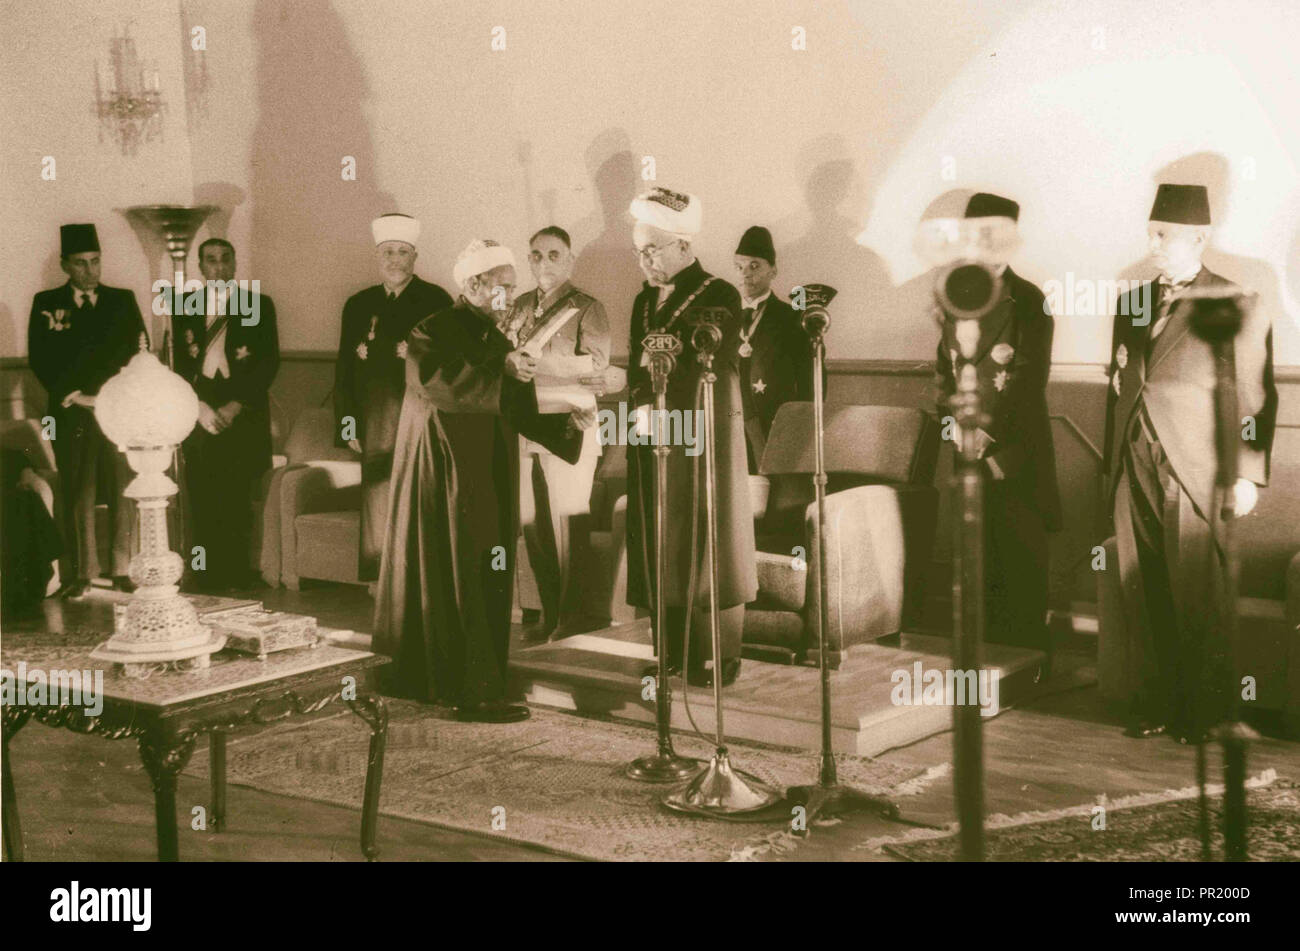 Coronation' of King Abdullah in Amman. Sheik handing King Abdullah proclamation of the 'crowning'. 1946, Jordan, Amman Stock Photo